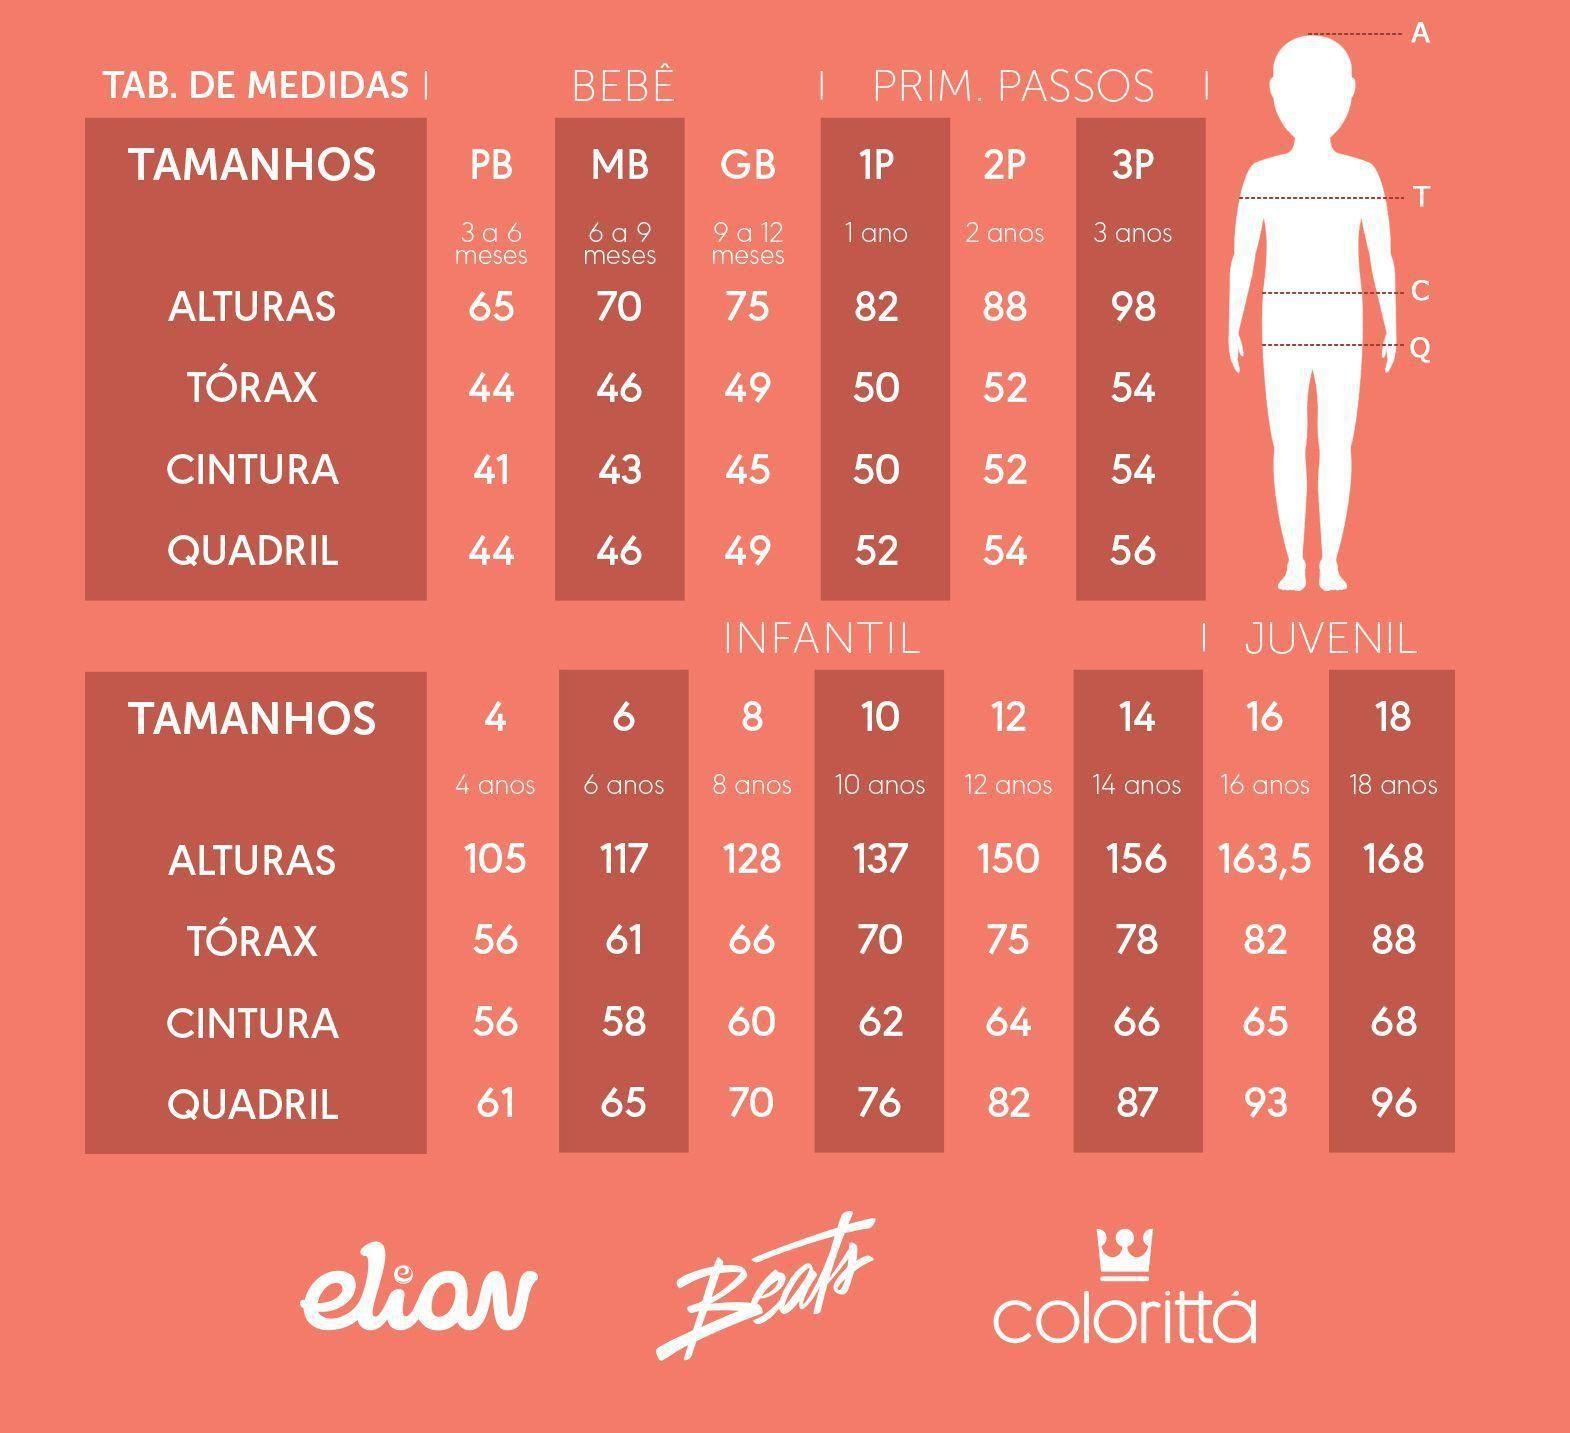 Calça Infantil Feminina Cinza Jogger - Elian: Tabela de medidas